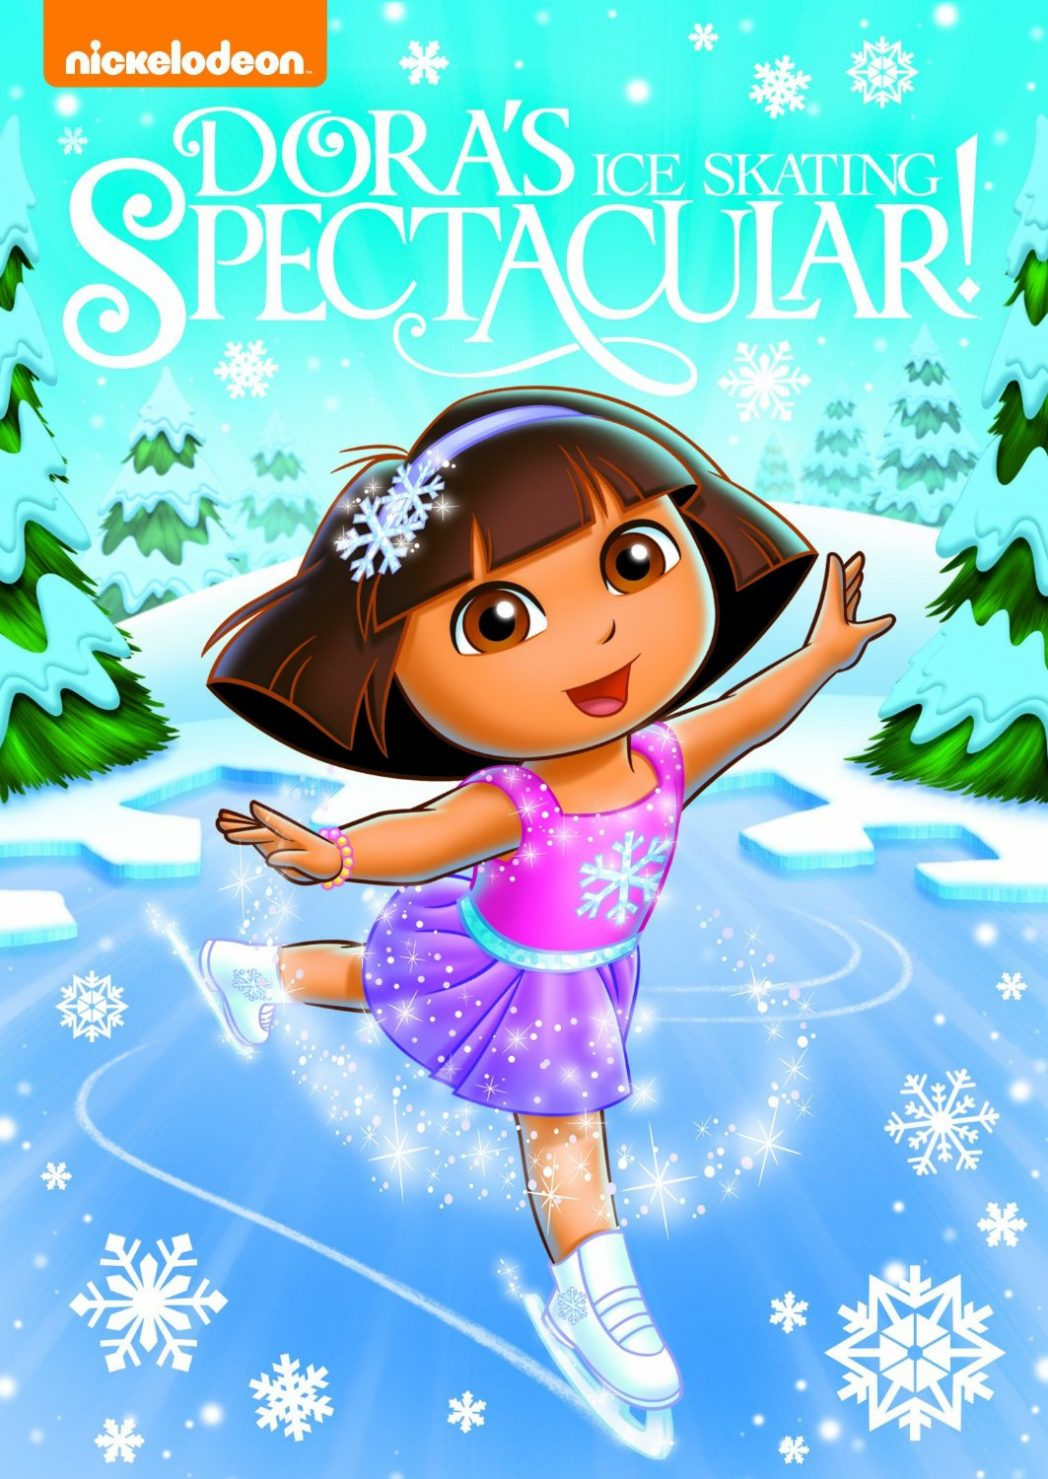 Dora's Ice Skating Spectacular and Spongebob SquarePants: It's A Spongebob Christmas!